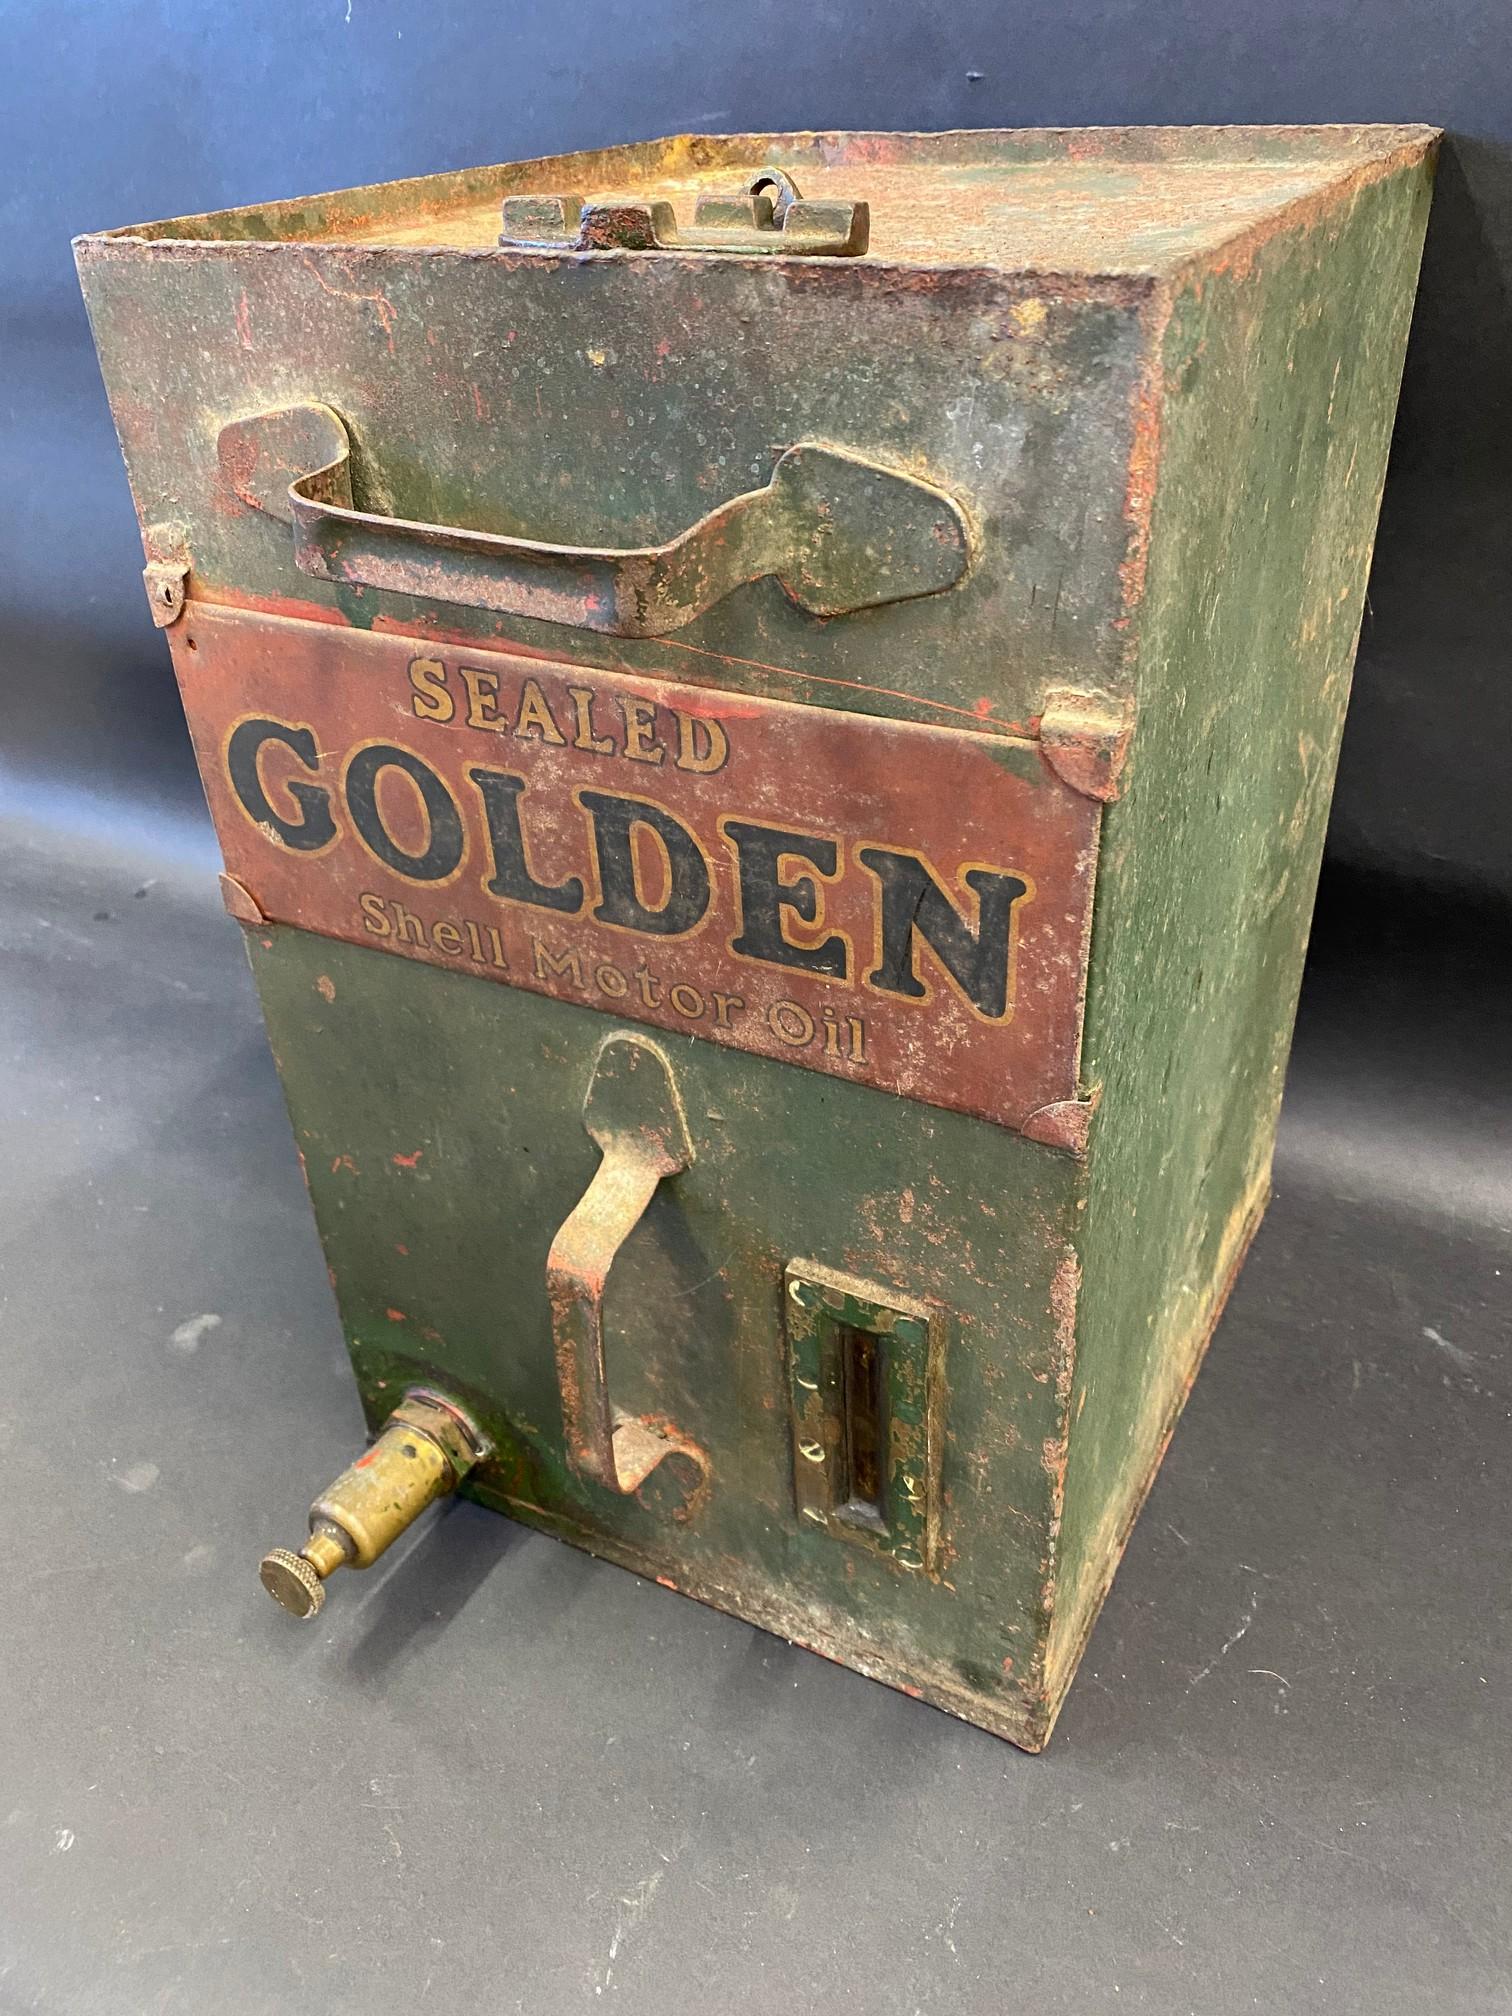 A Sealed Golden Shell motor oil cabinet tank.